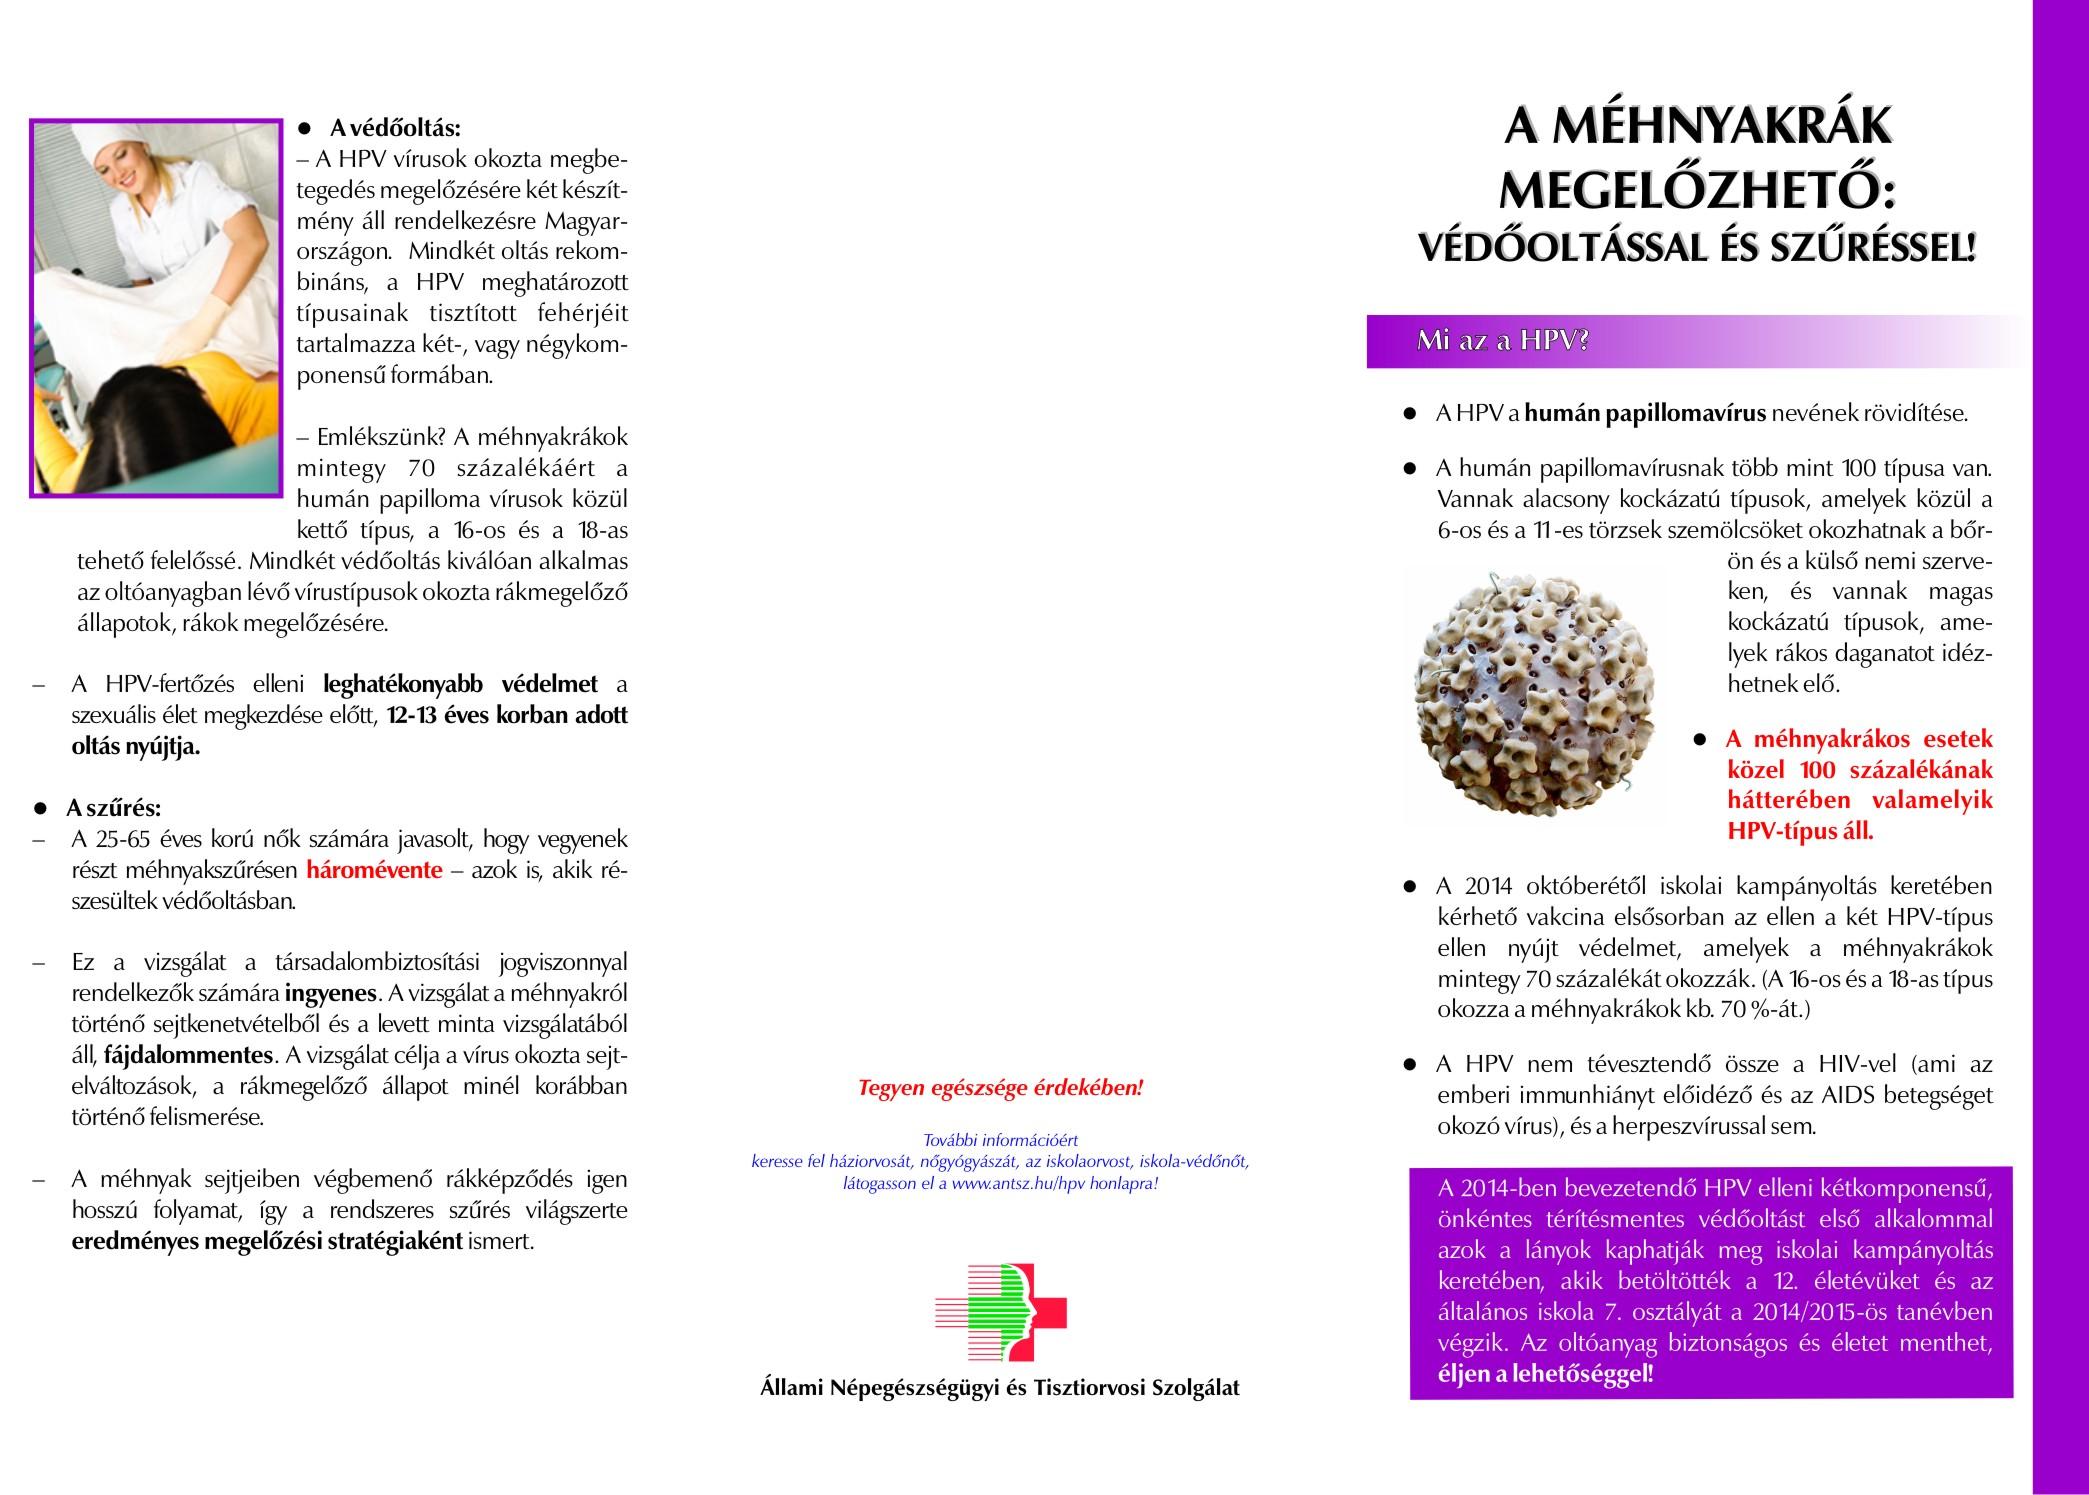 emberi papilloma vírus elleni védelem